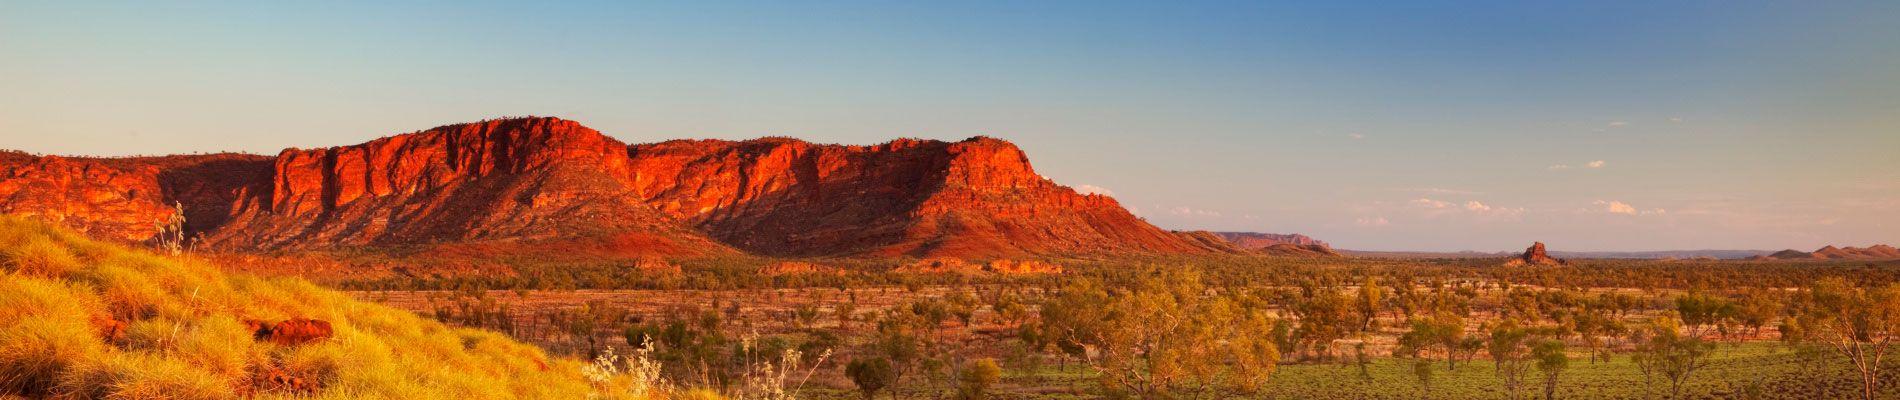 australie-purnululu-western-st